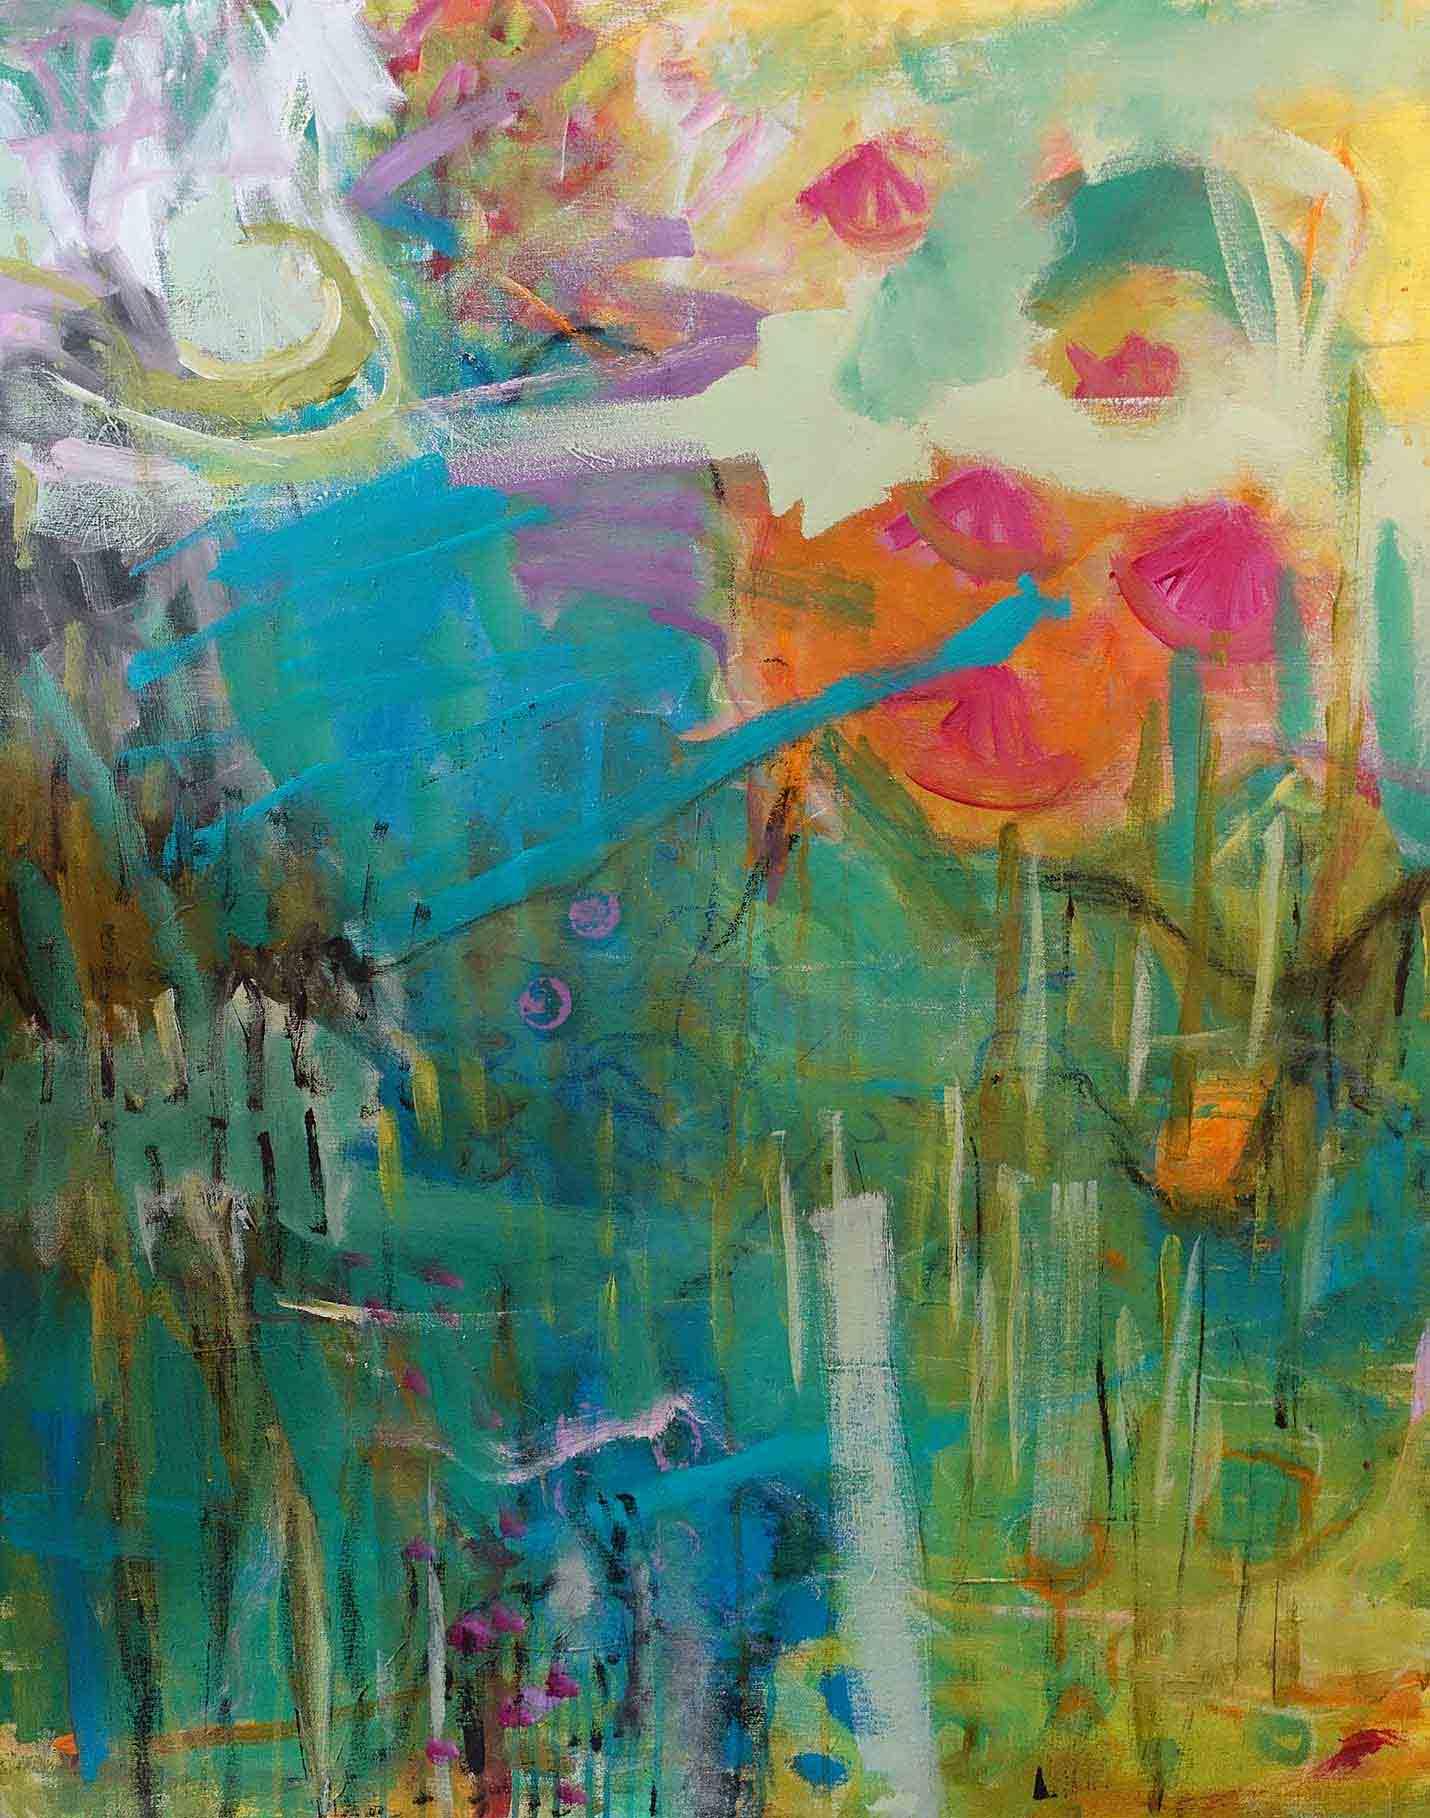 Malerei auf Leinwand 2